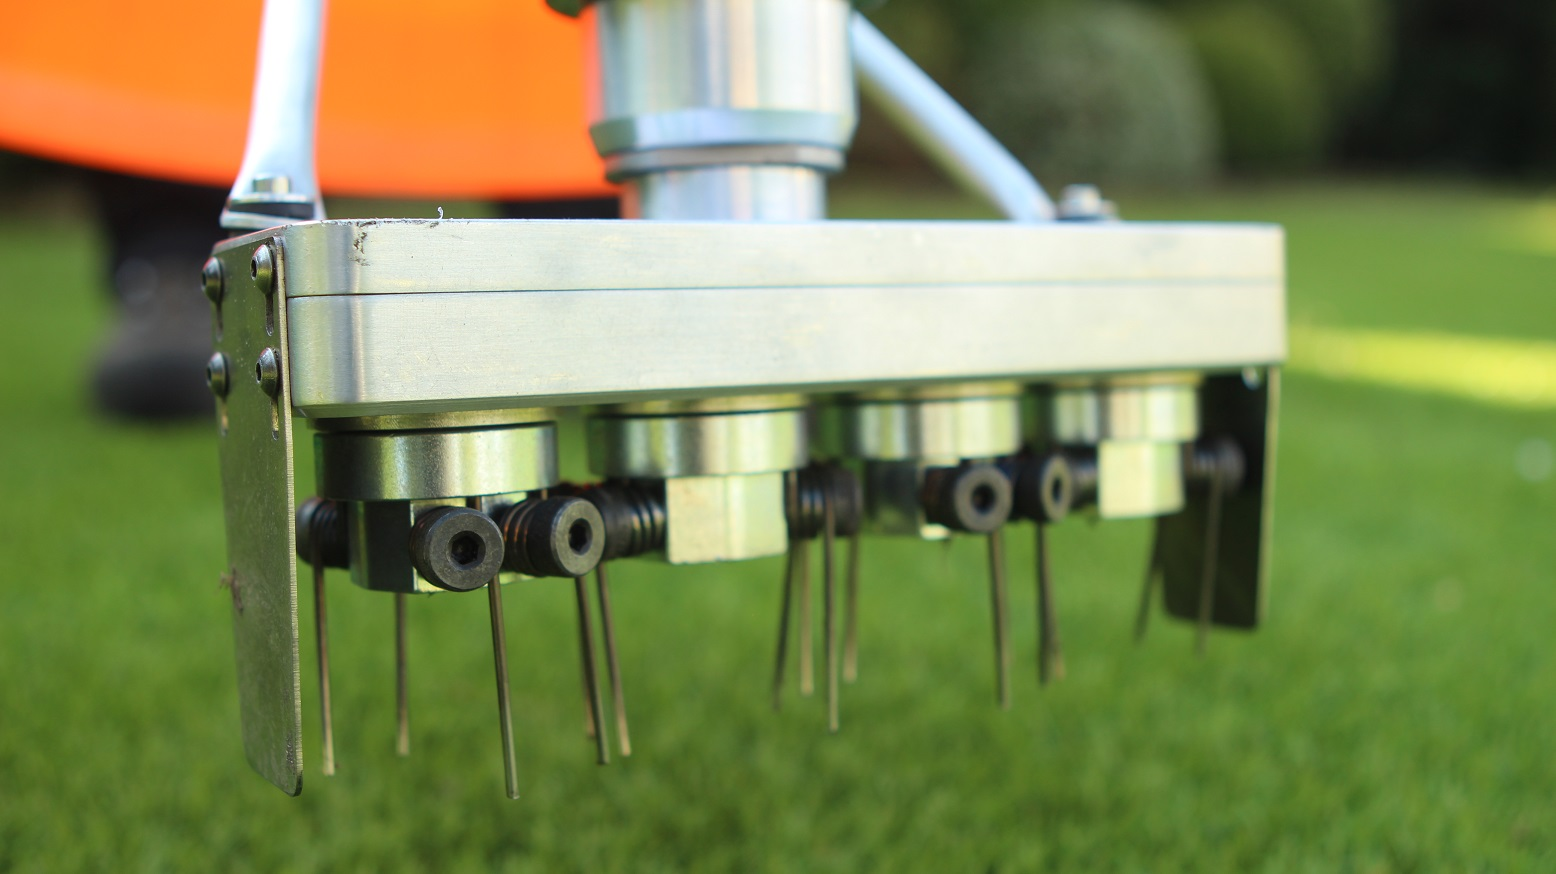 Topkeeper Pro brush clean artificial turf